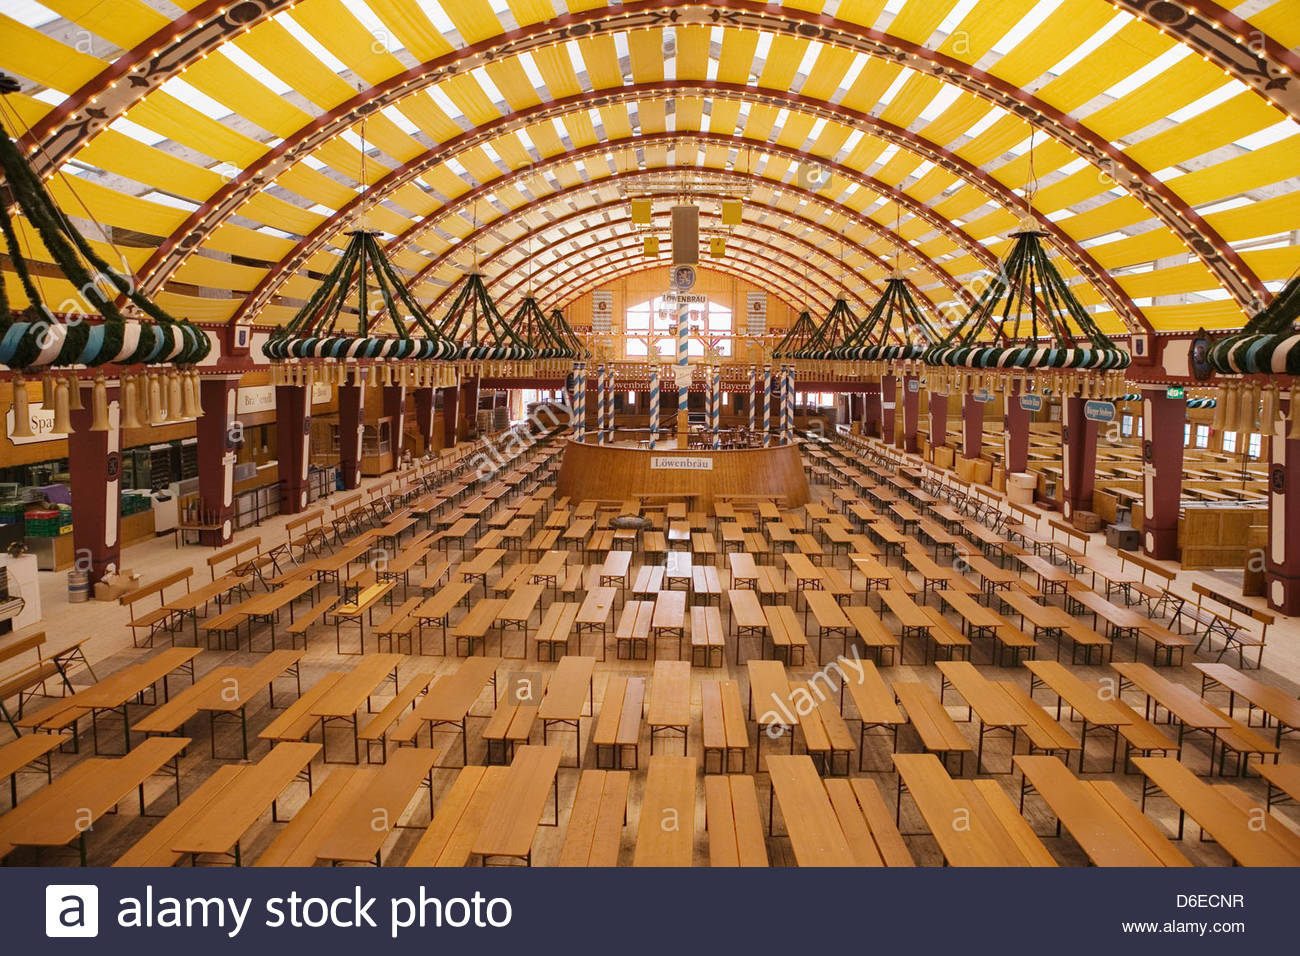 Interior Empty Beer Tent Oktoberfest Munich Germany Stock